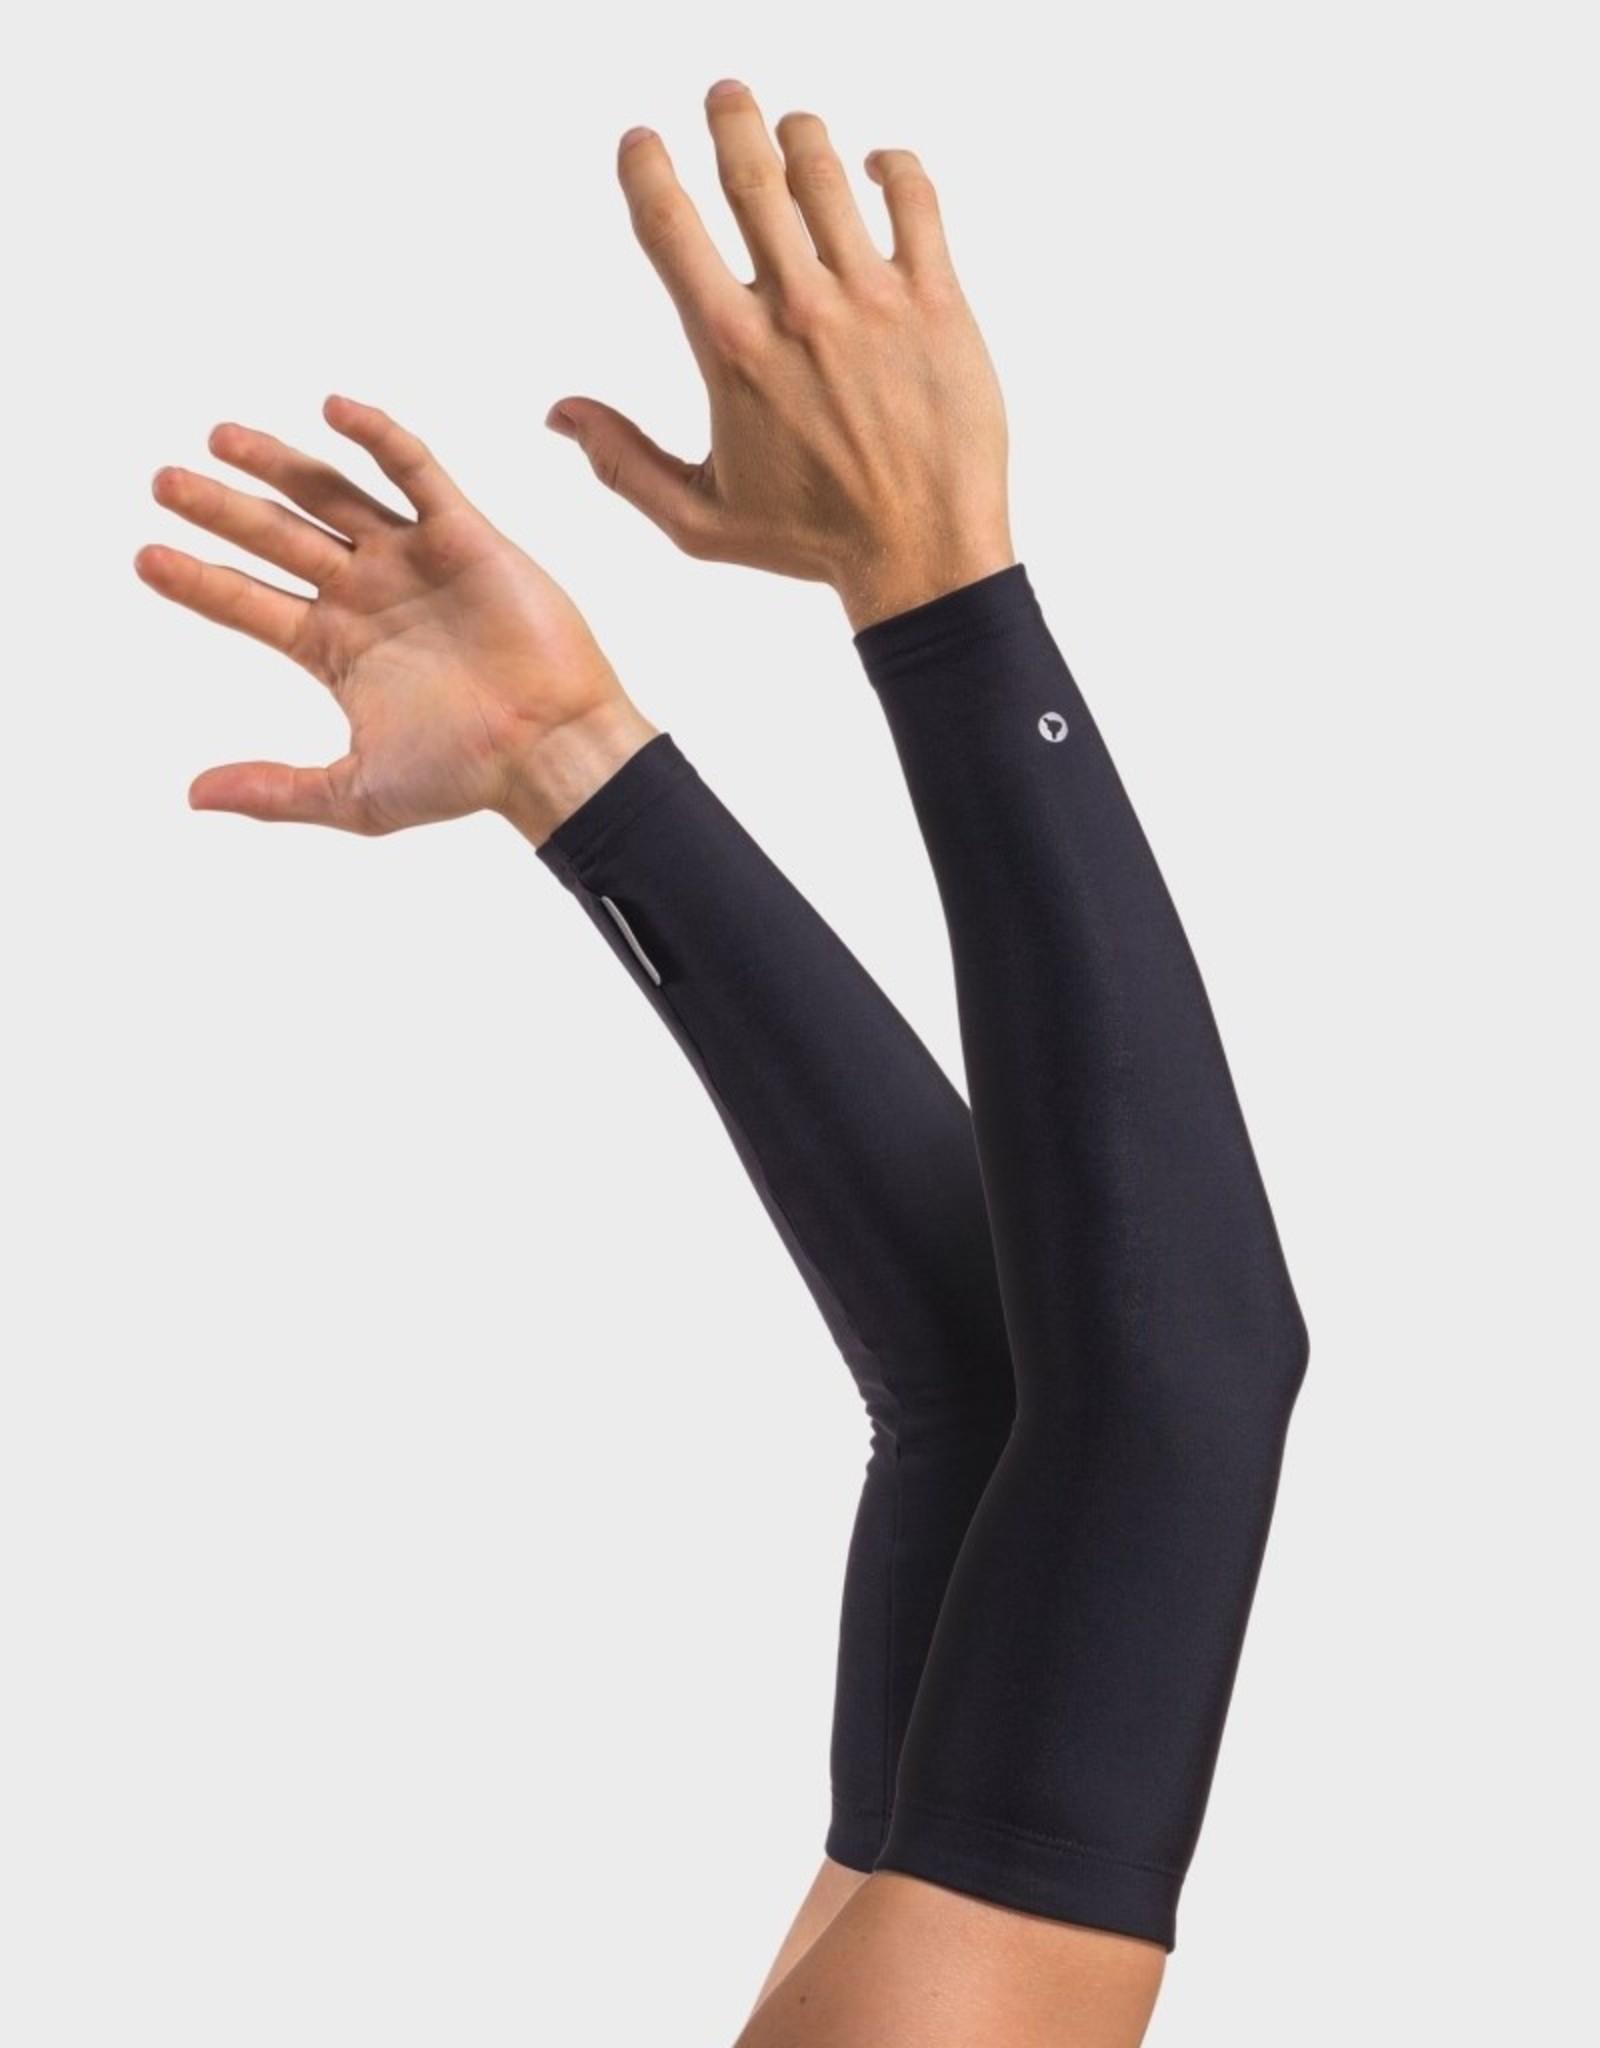 Black Sheep Cycling Elements Arm Warmers - Black